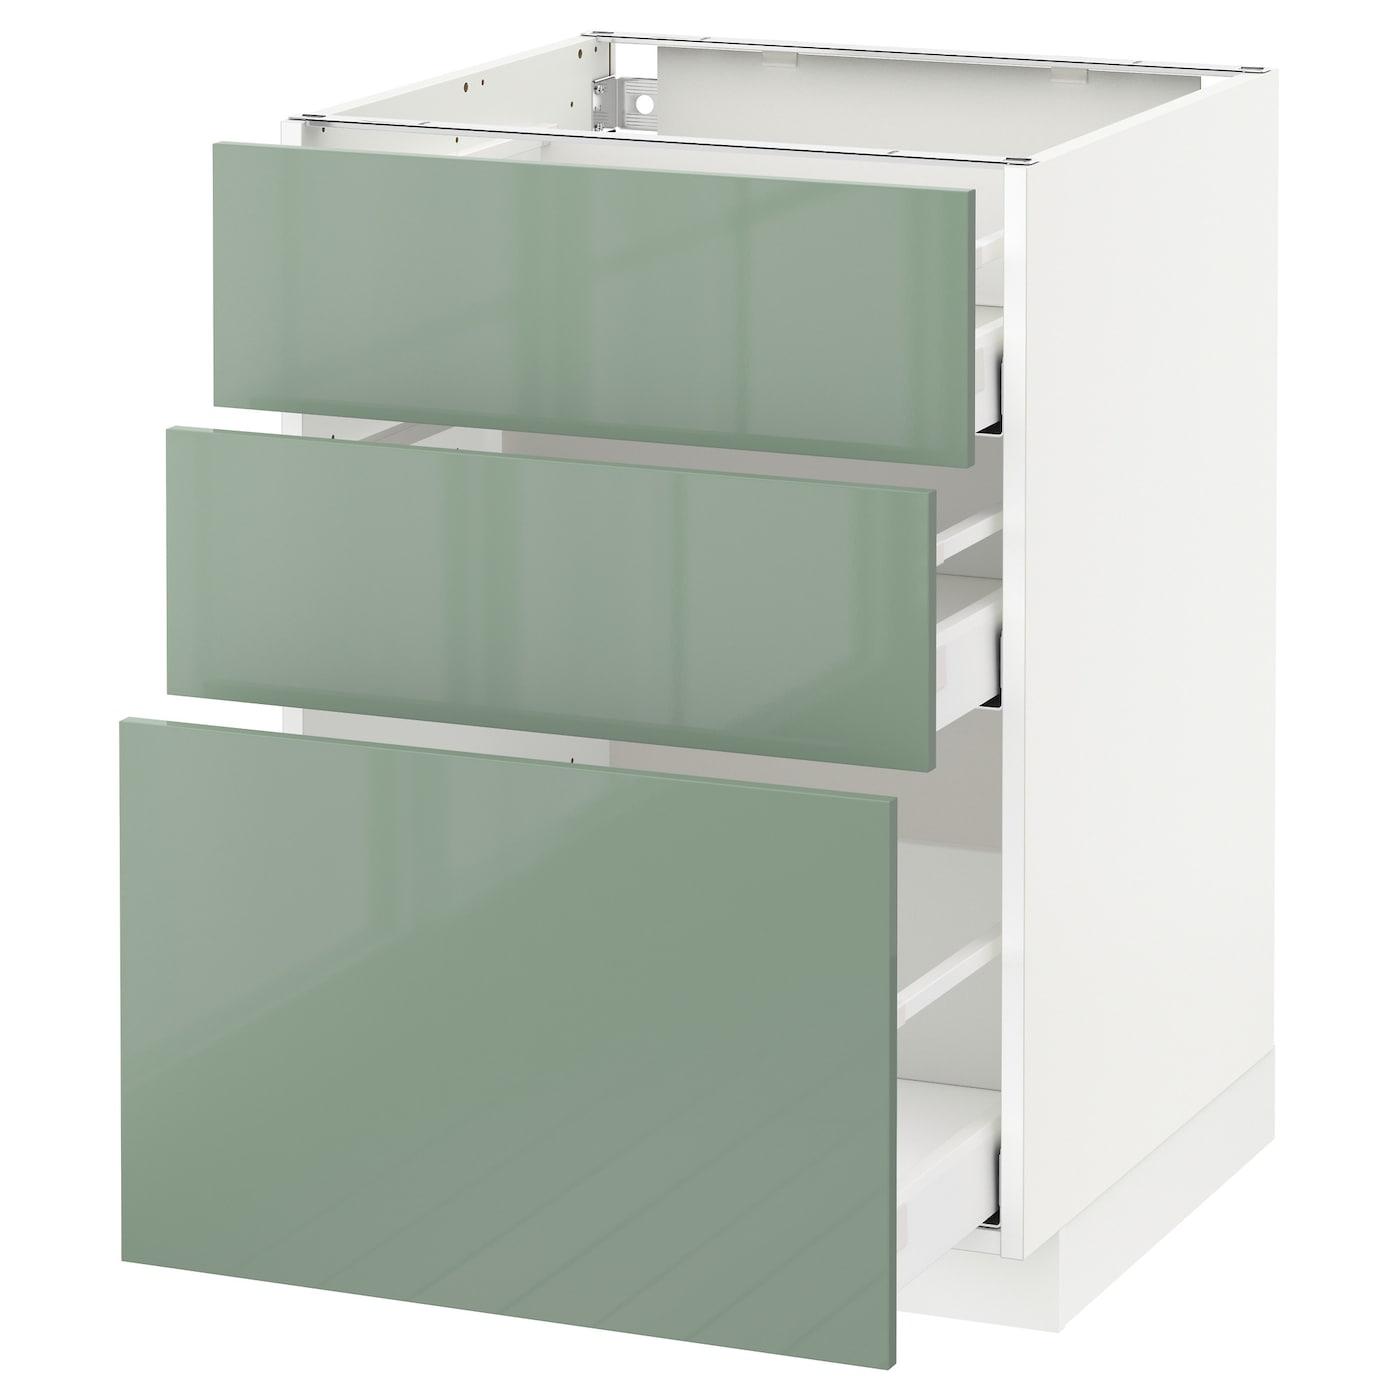 Ikea Green Kitchen Cabinets: METOD/MAXIMERA Base Cabinet With 3 Drawers White/kallarp